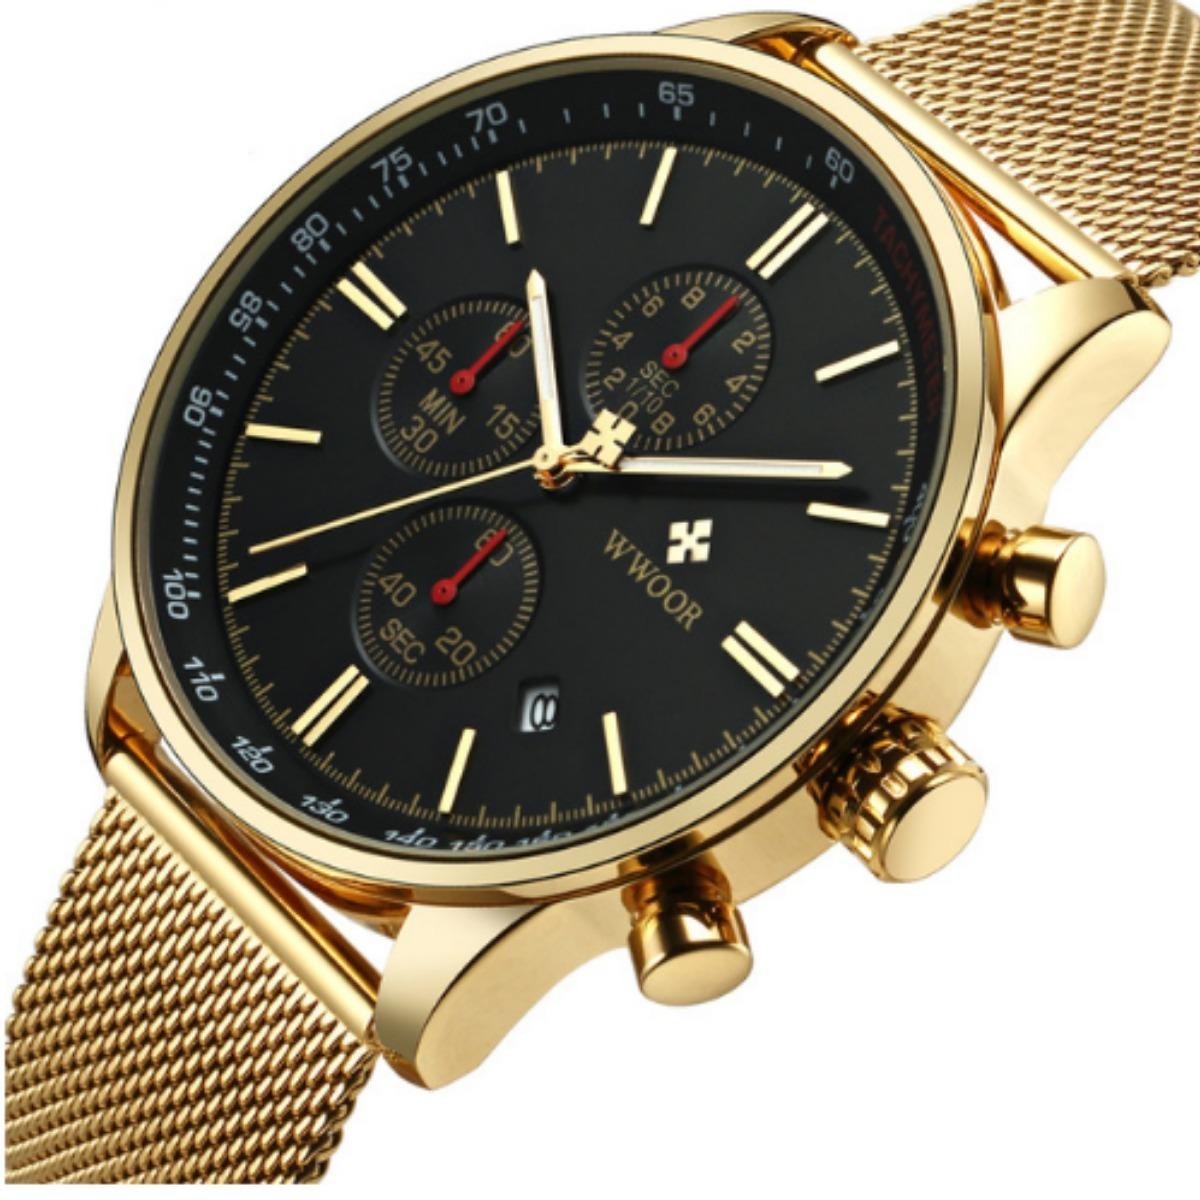 789d5757d56 relógio masculino dourado original luxo analógico wwoor 8862. Carregando  zoom.